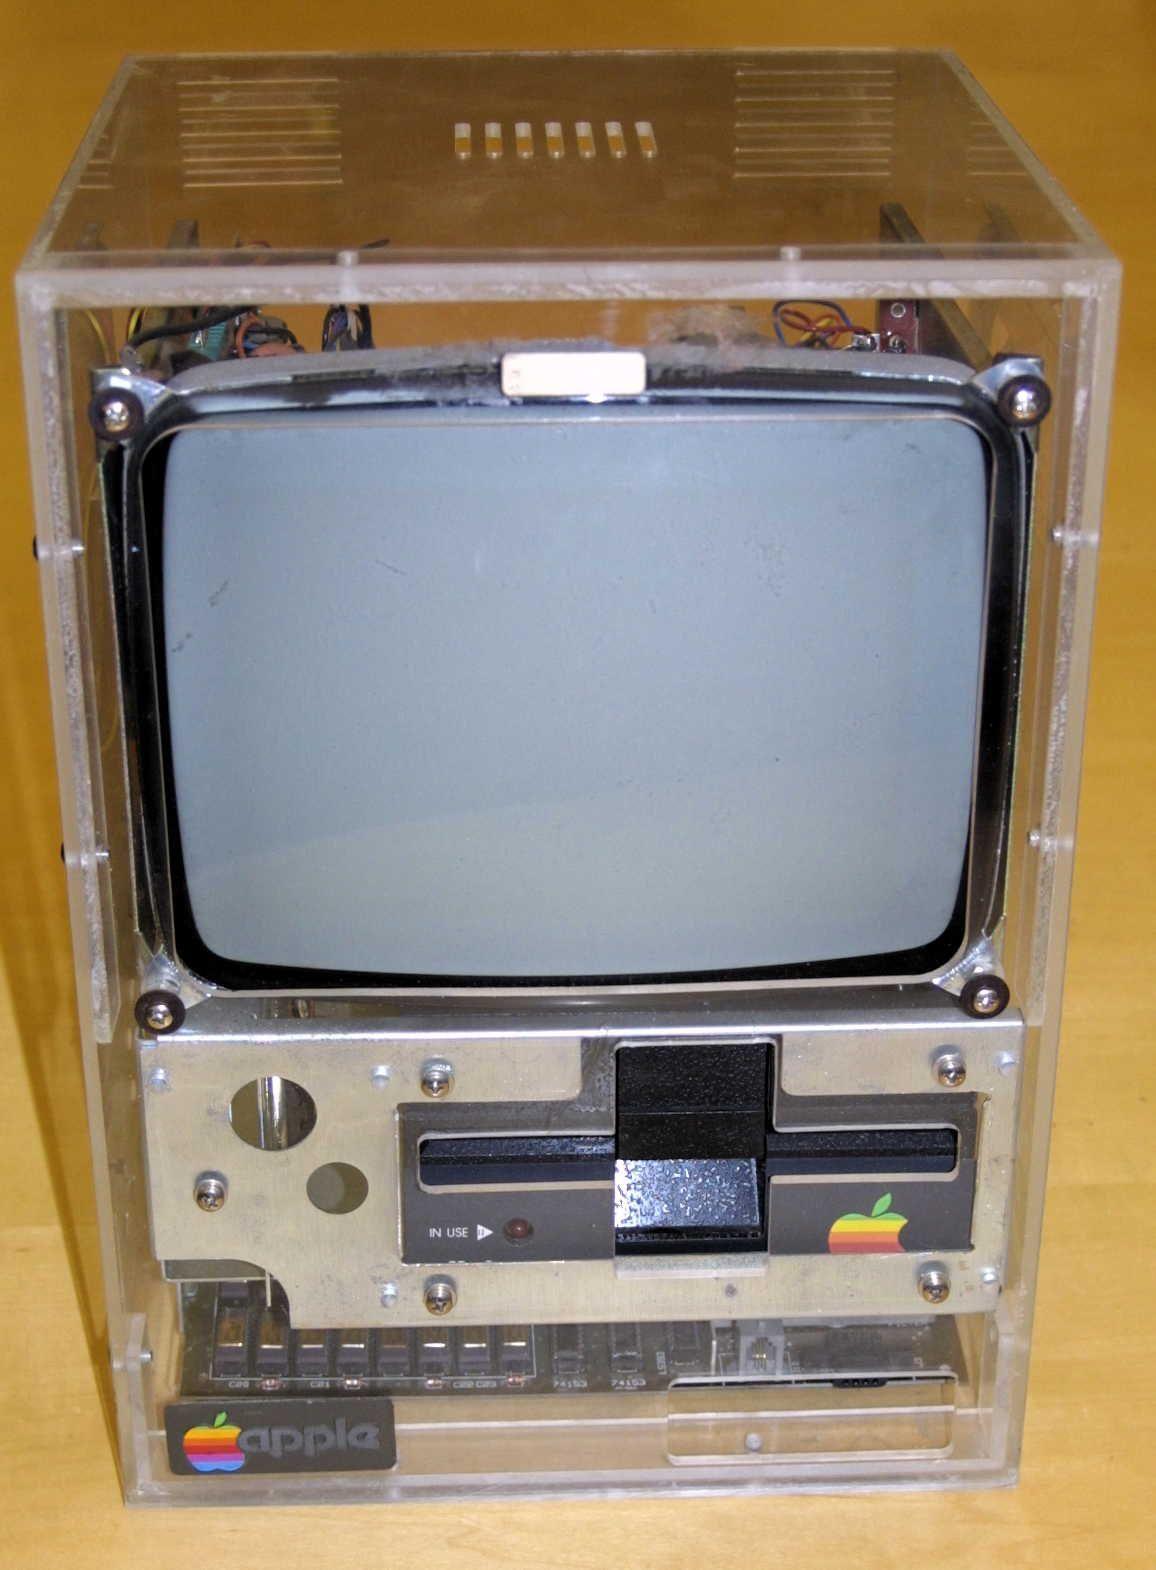 Macintosh prototype 1981 by Apple Inc 맥, 컴퓨터